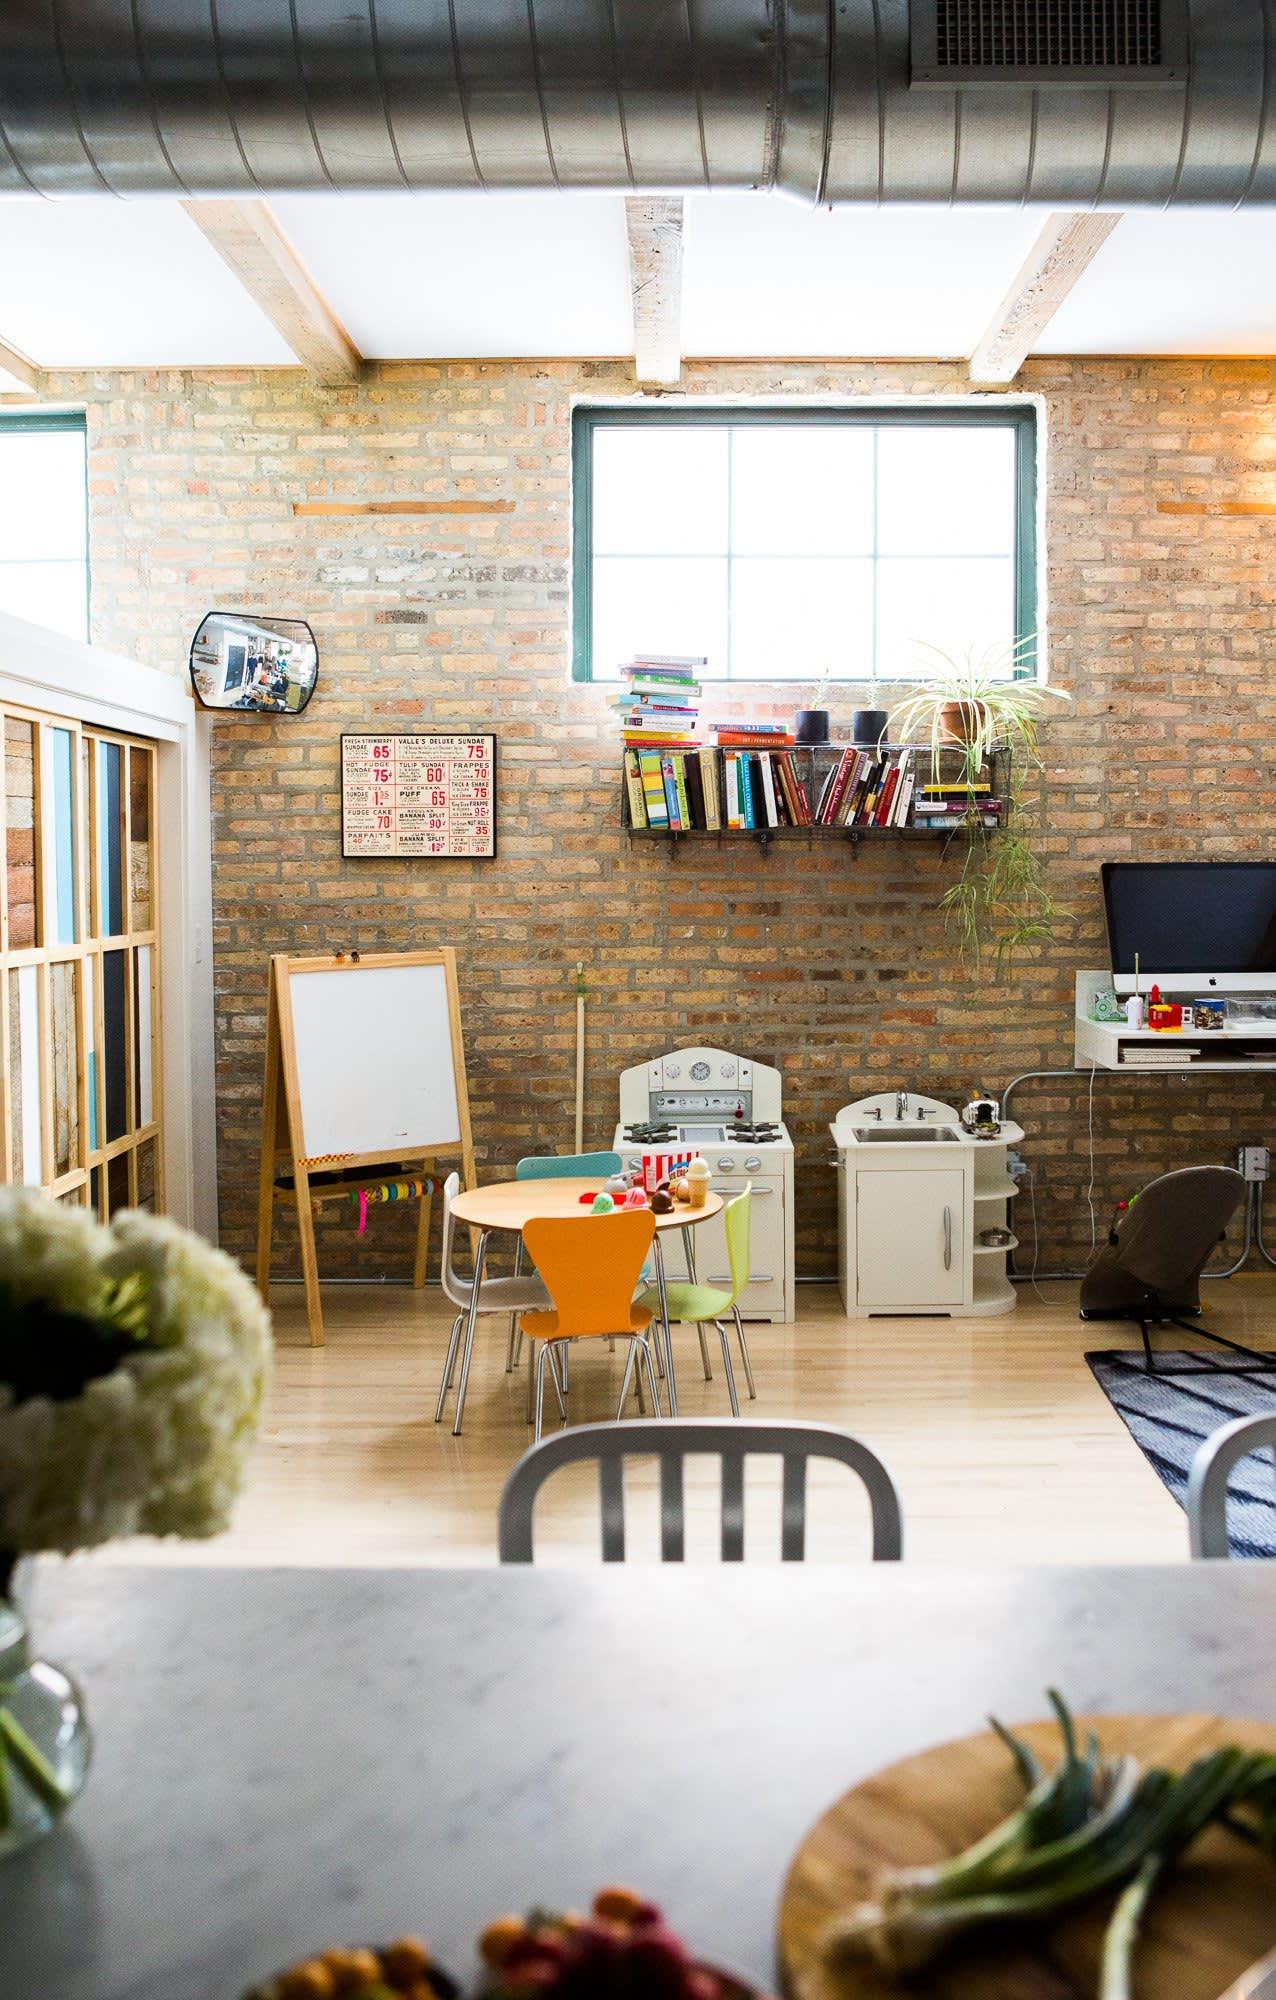 Ellen & Greg's Renovated Loft Kitchen: gallery image 14